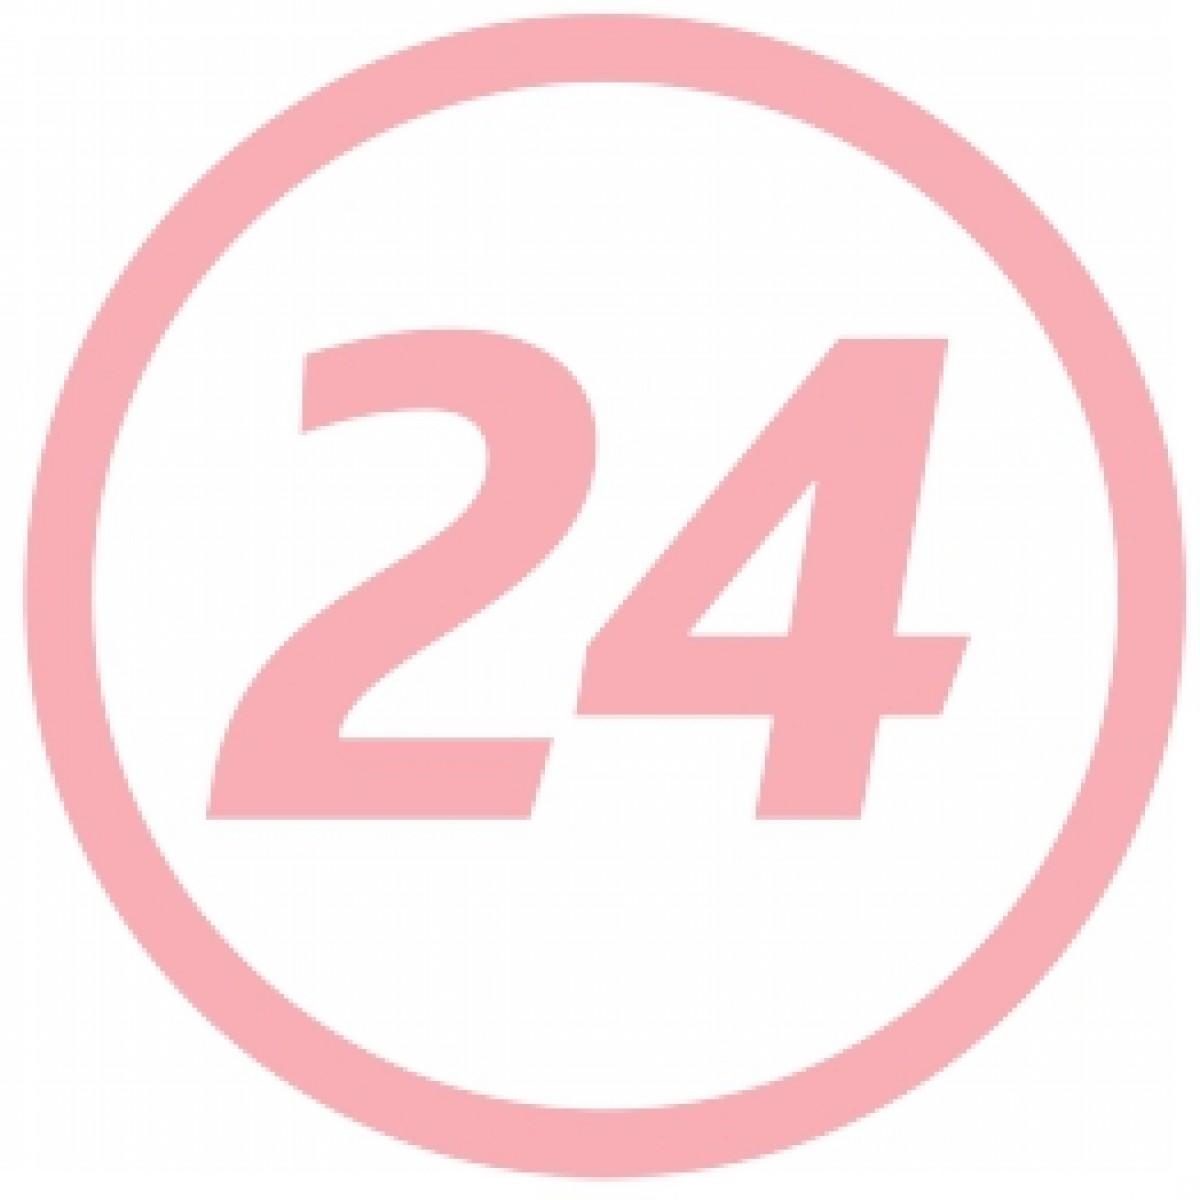 Hartman Omnistrip Plasture Pentru Inlocuirea Suturilor Chirurgicale 25 x 127 mm, Plasture, 50buc x 2 benzi